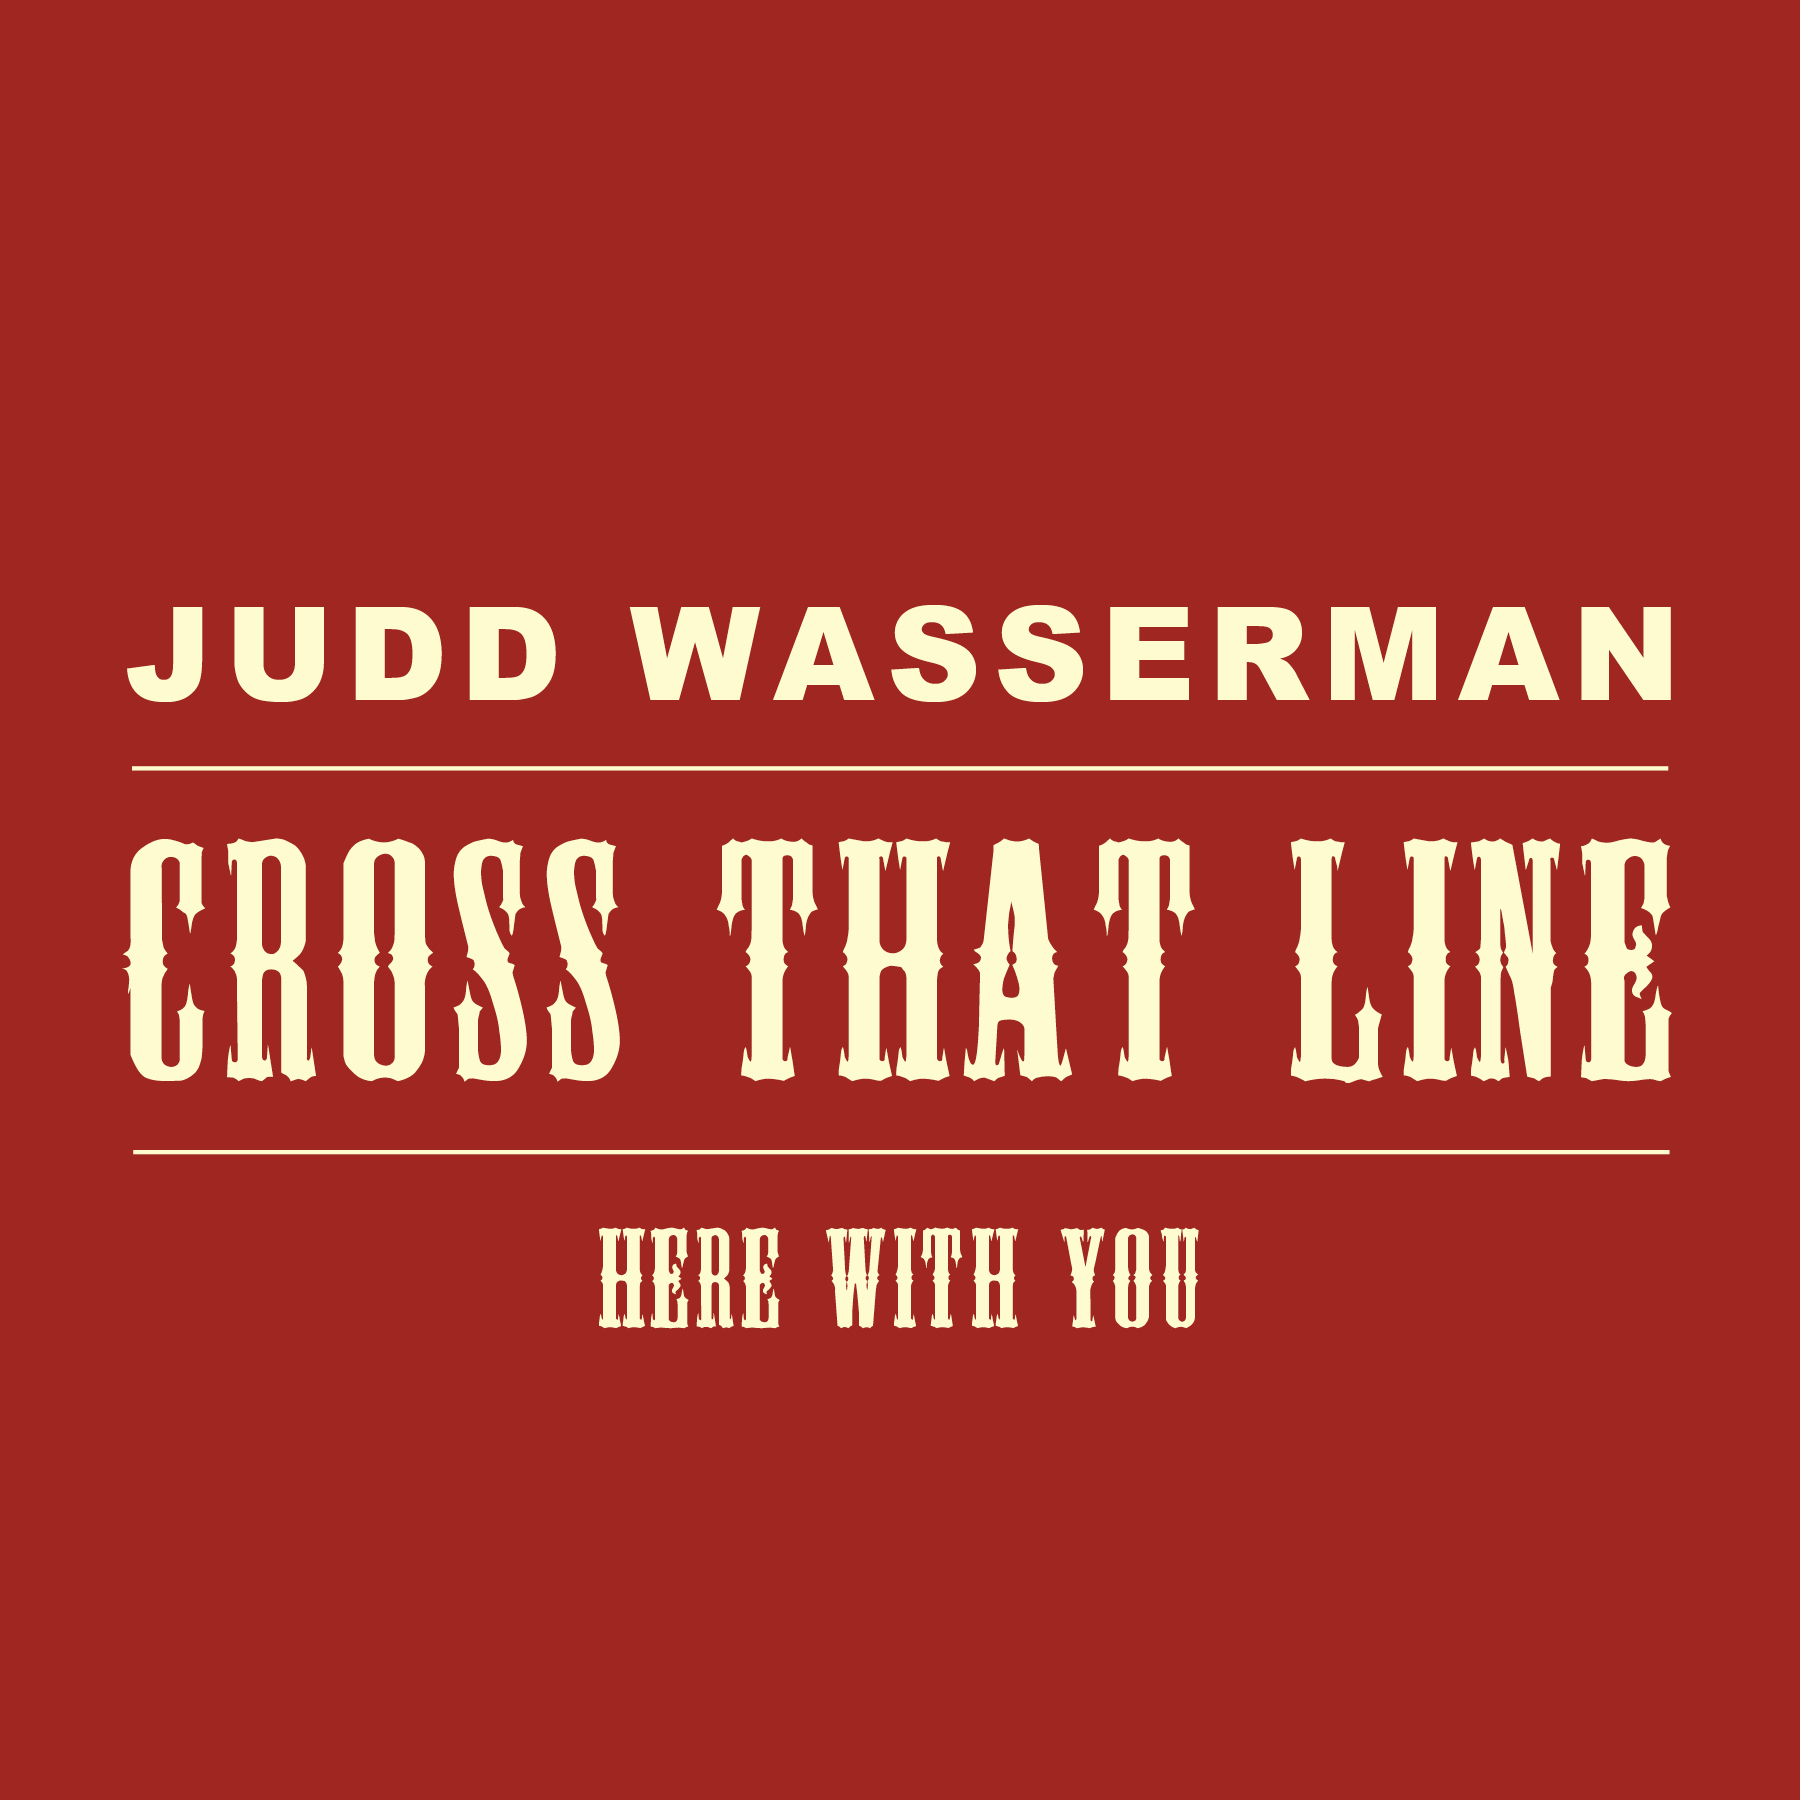 JW_CrossThatLine_Alt3.jpg